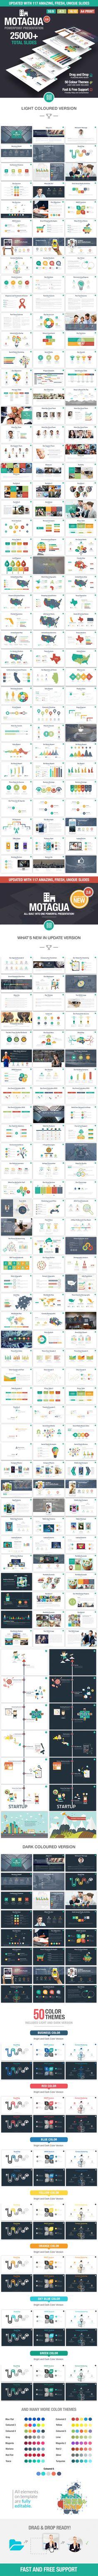 Motagua - Multipurpose PowerPoint Template PowerPoint Template / Theme / Presentation / Slides / Background / Power Point #powerpoint #template #theme